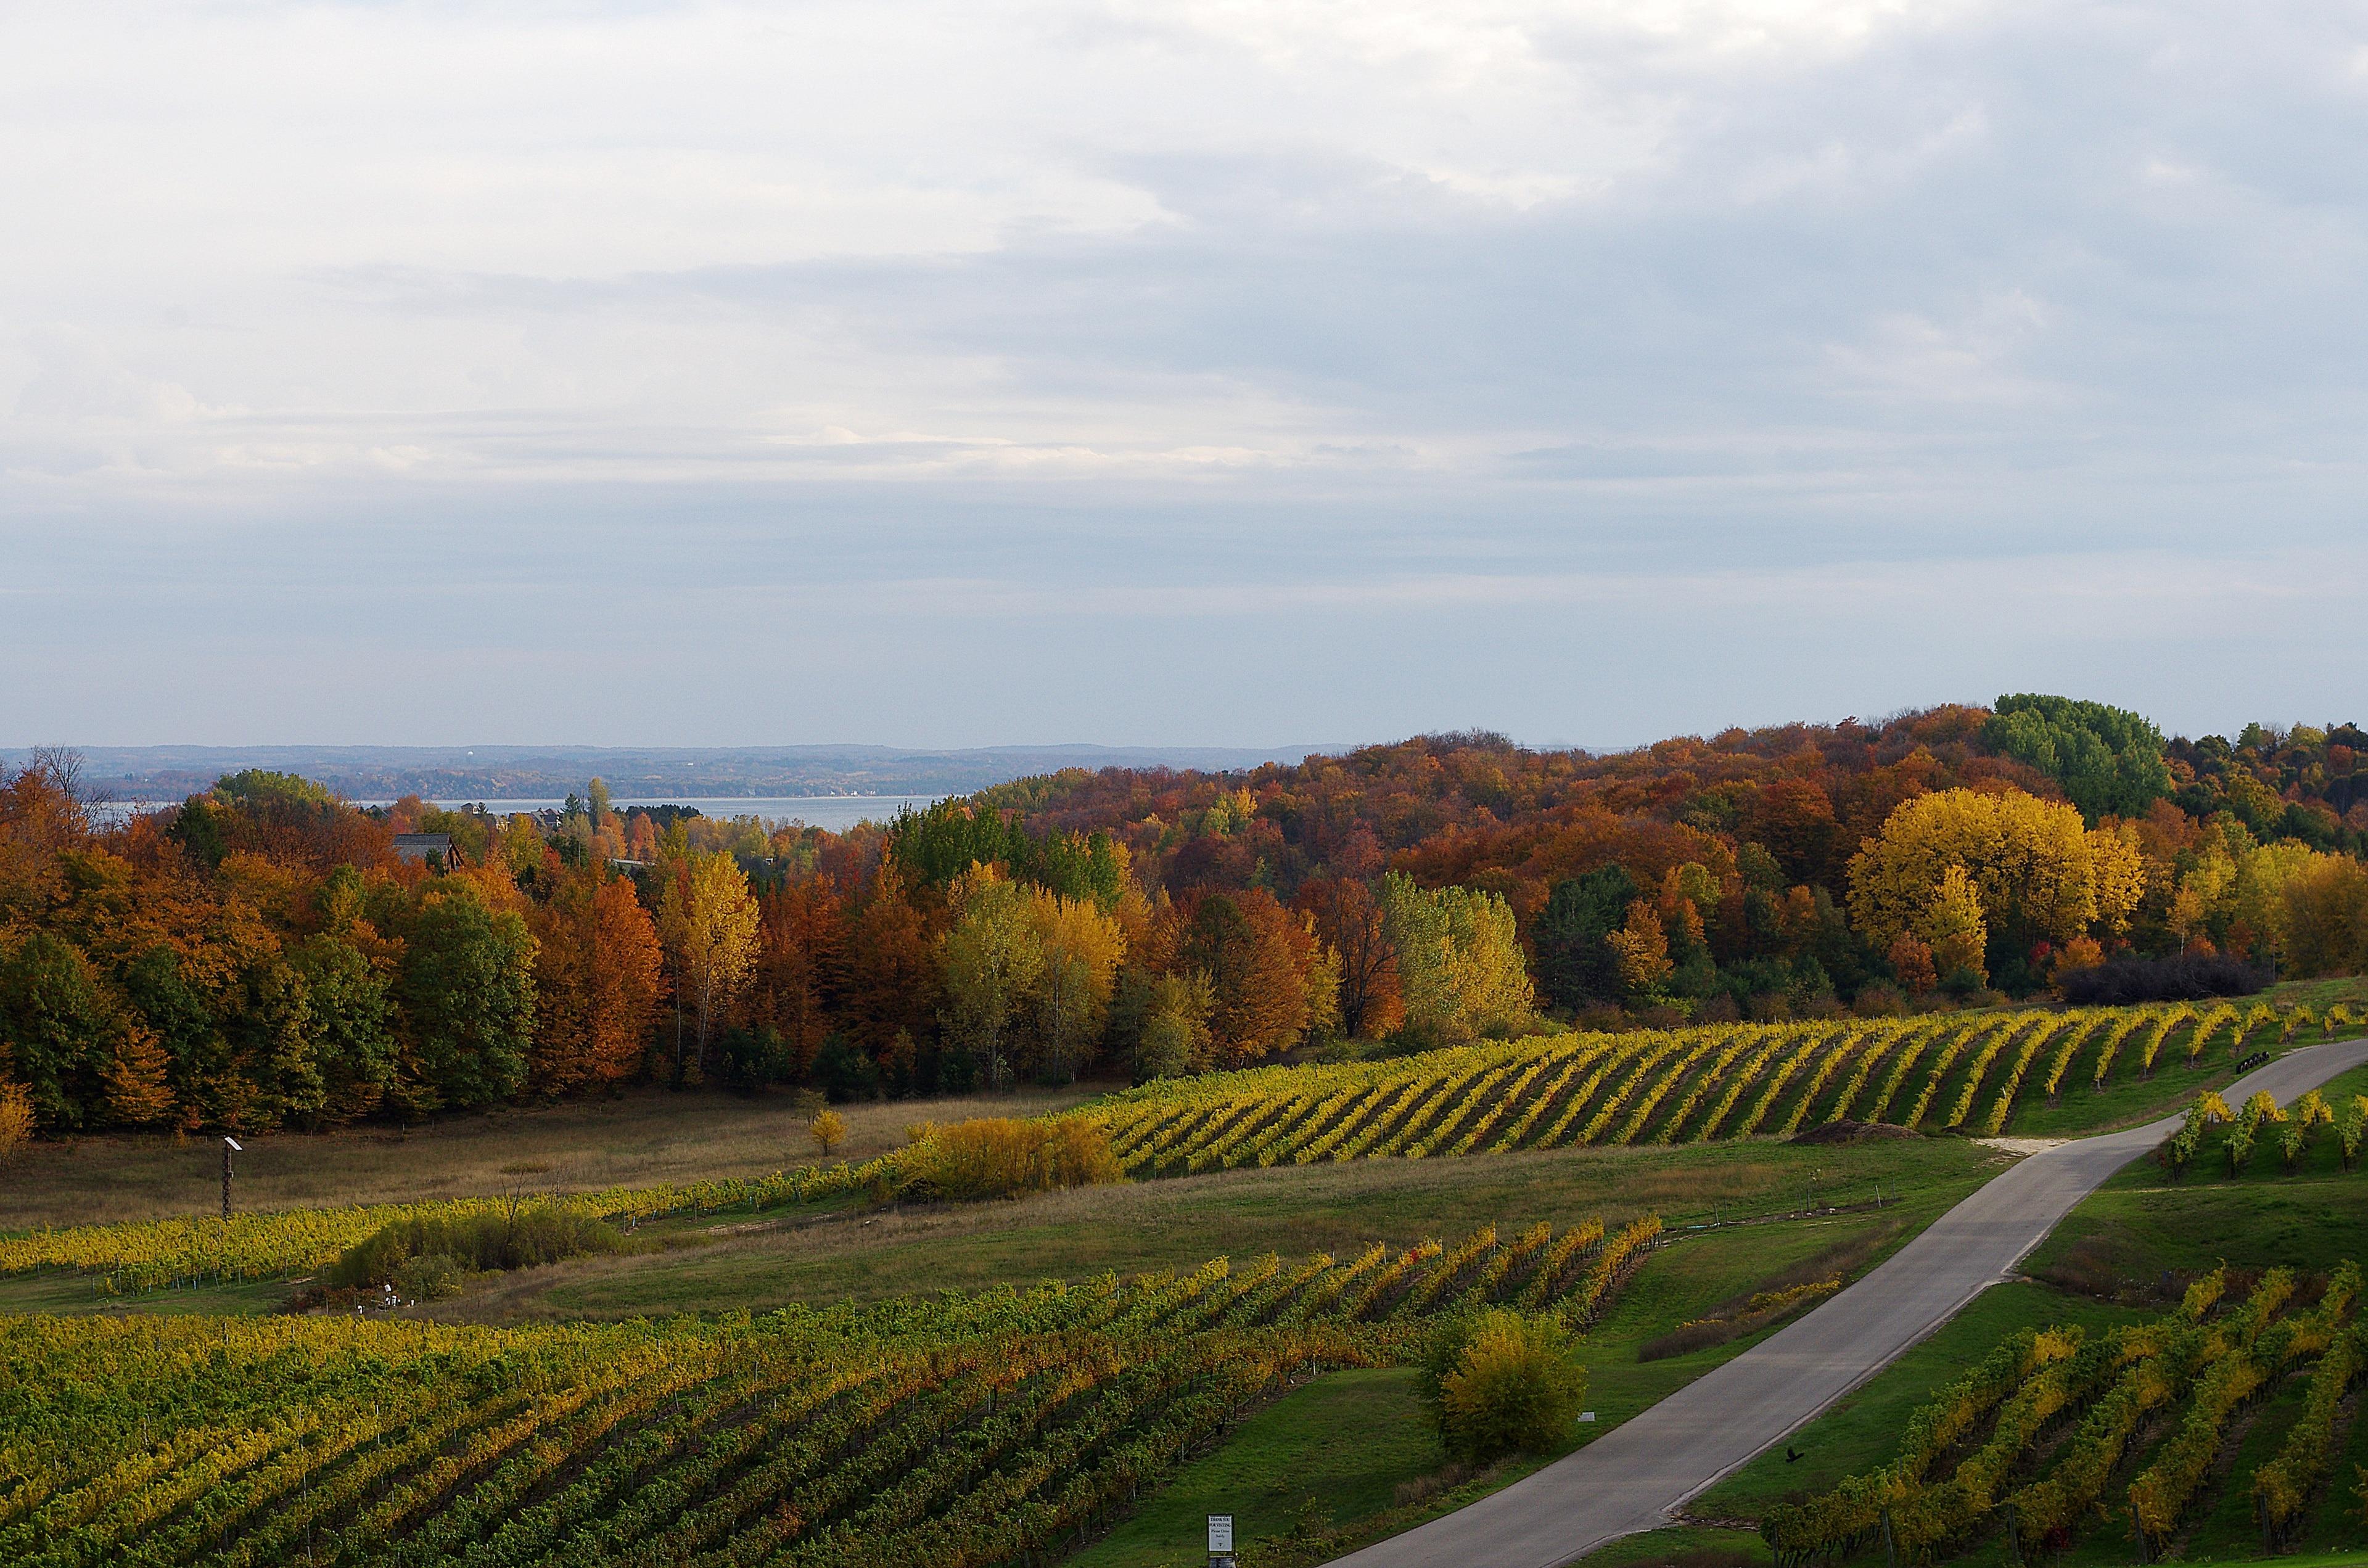 Leelanau Township, Michigan, United States of America